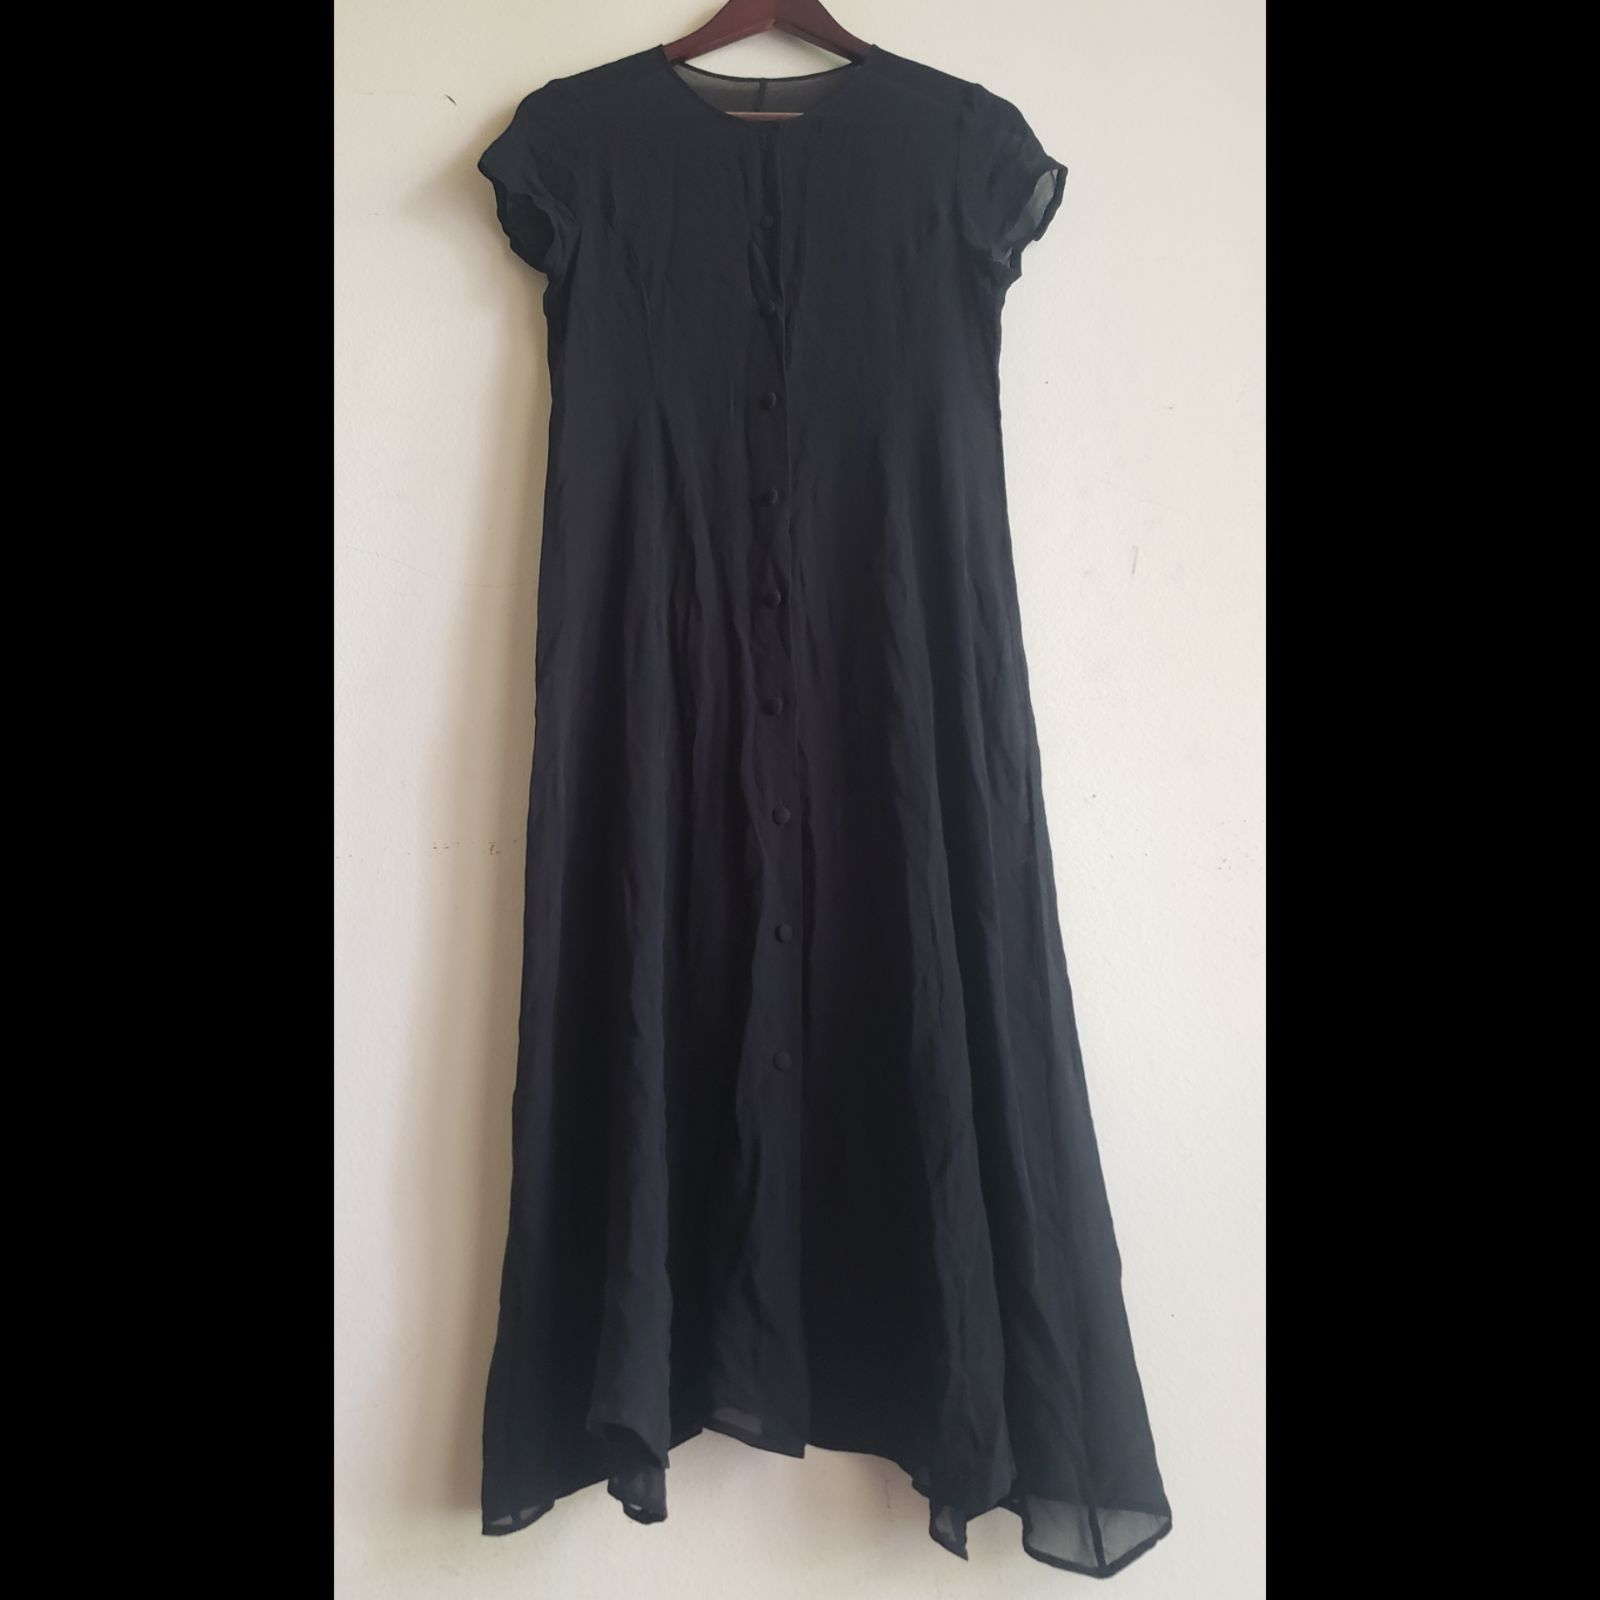 Goth Romantic Maxi Sheer Button-Up Dress